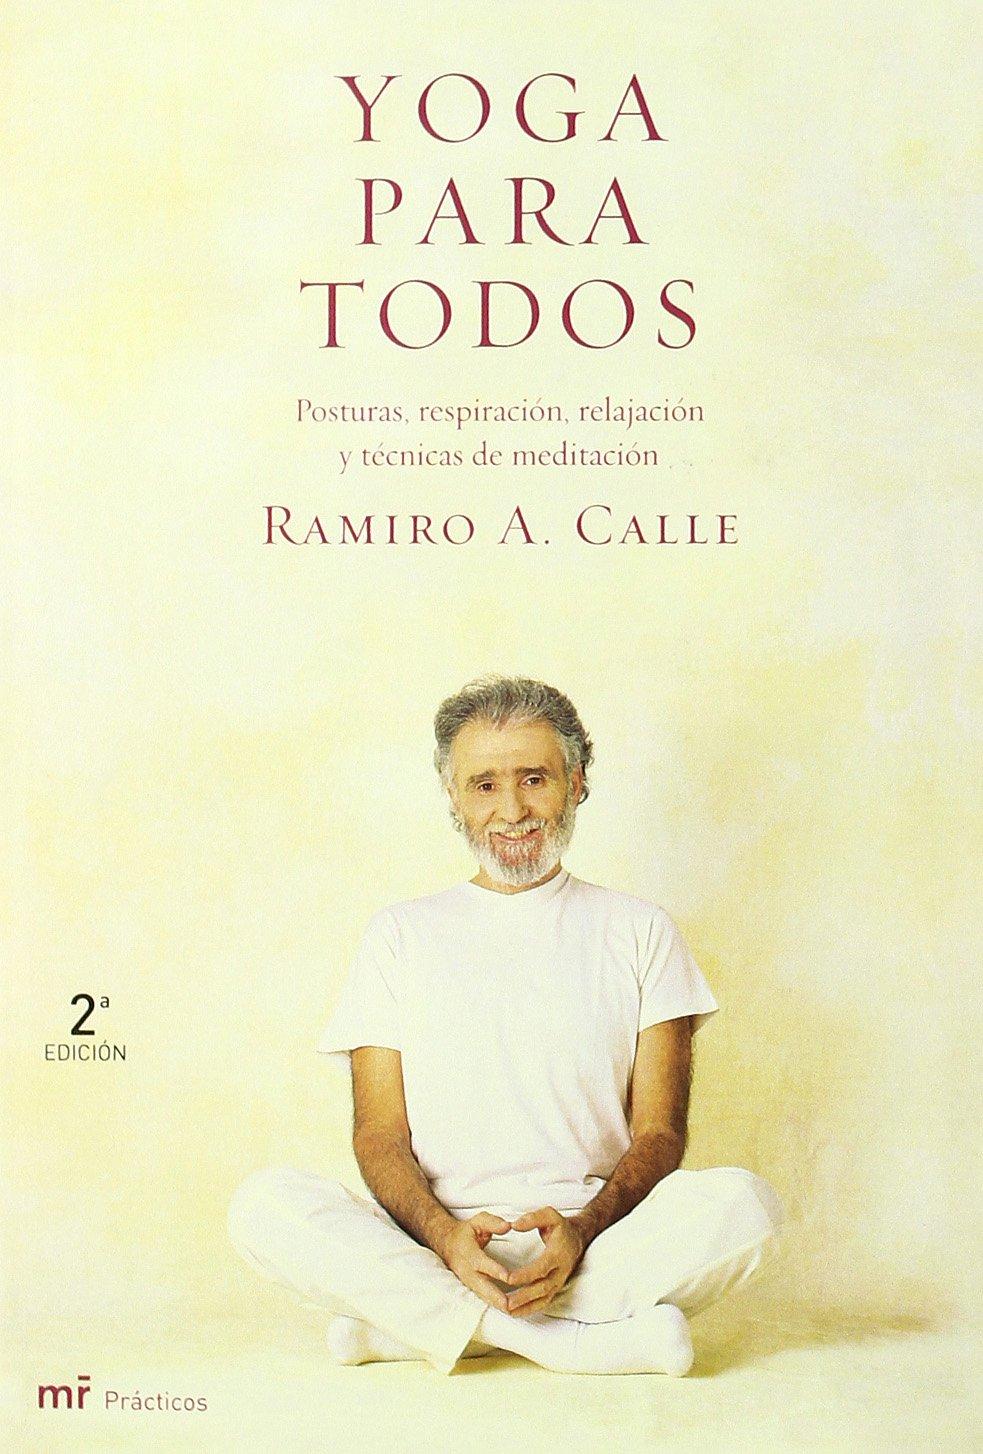 Amazon.com: Yoga Para Todos (Spanish Edition) (9788427030602 ...